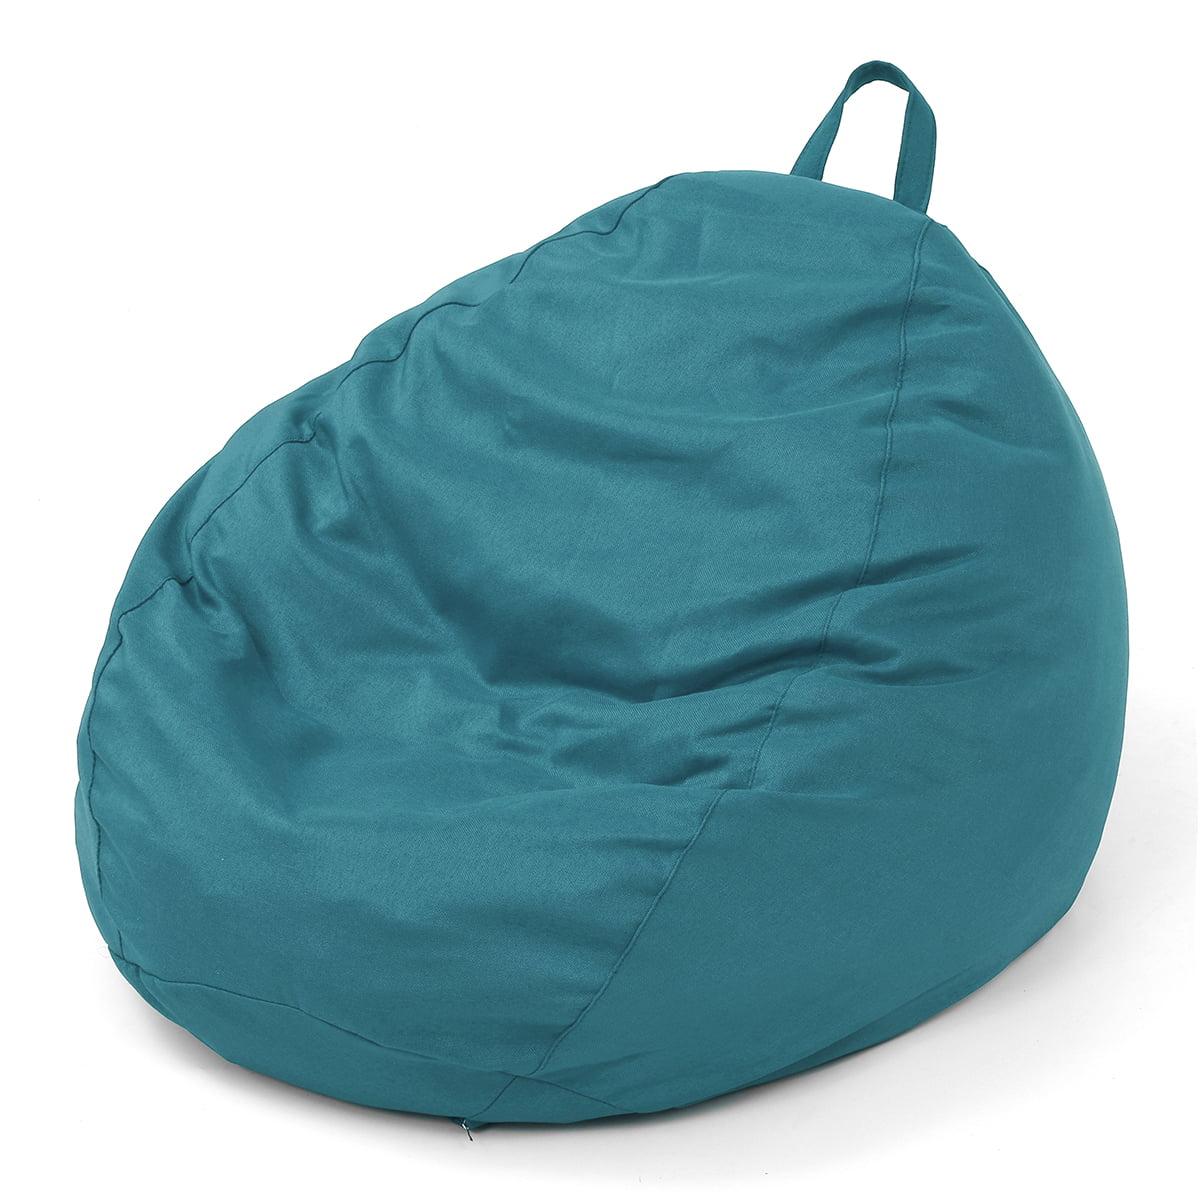 Bean Bag Chair Cover Indoor/Outdoor Gamer Beanbag Seat ...